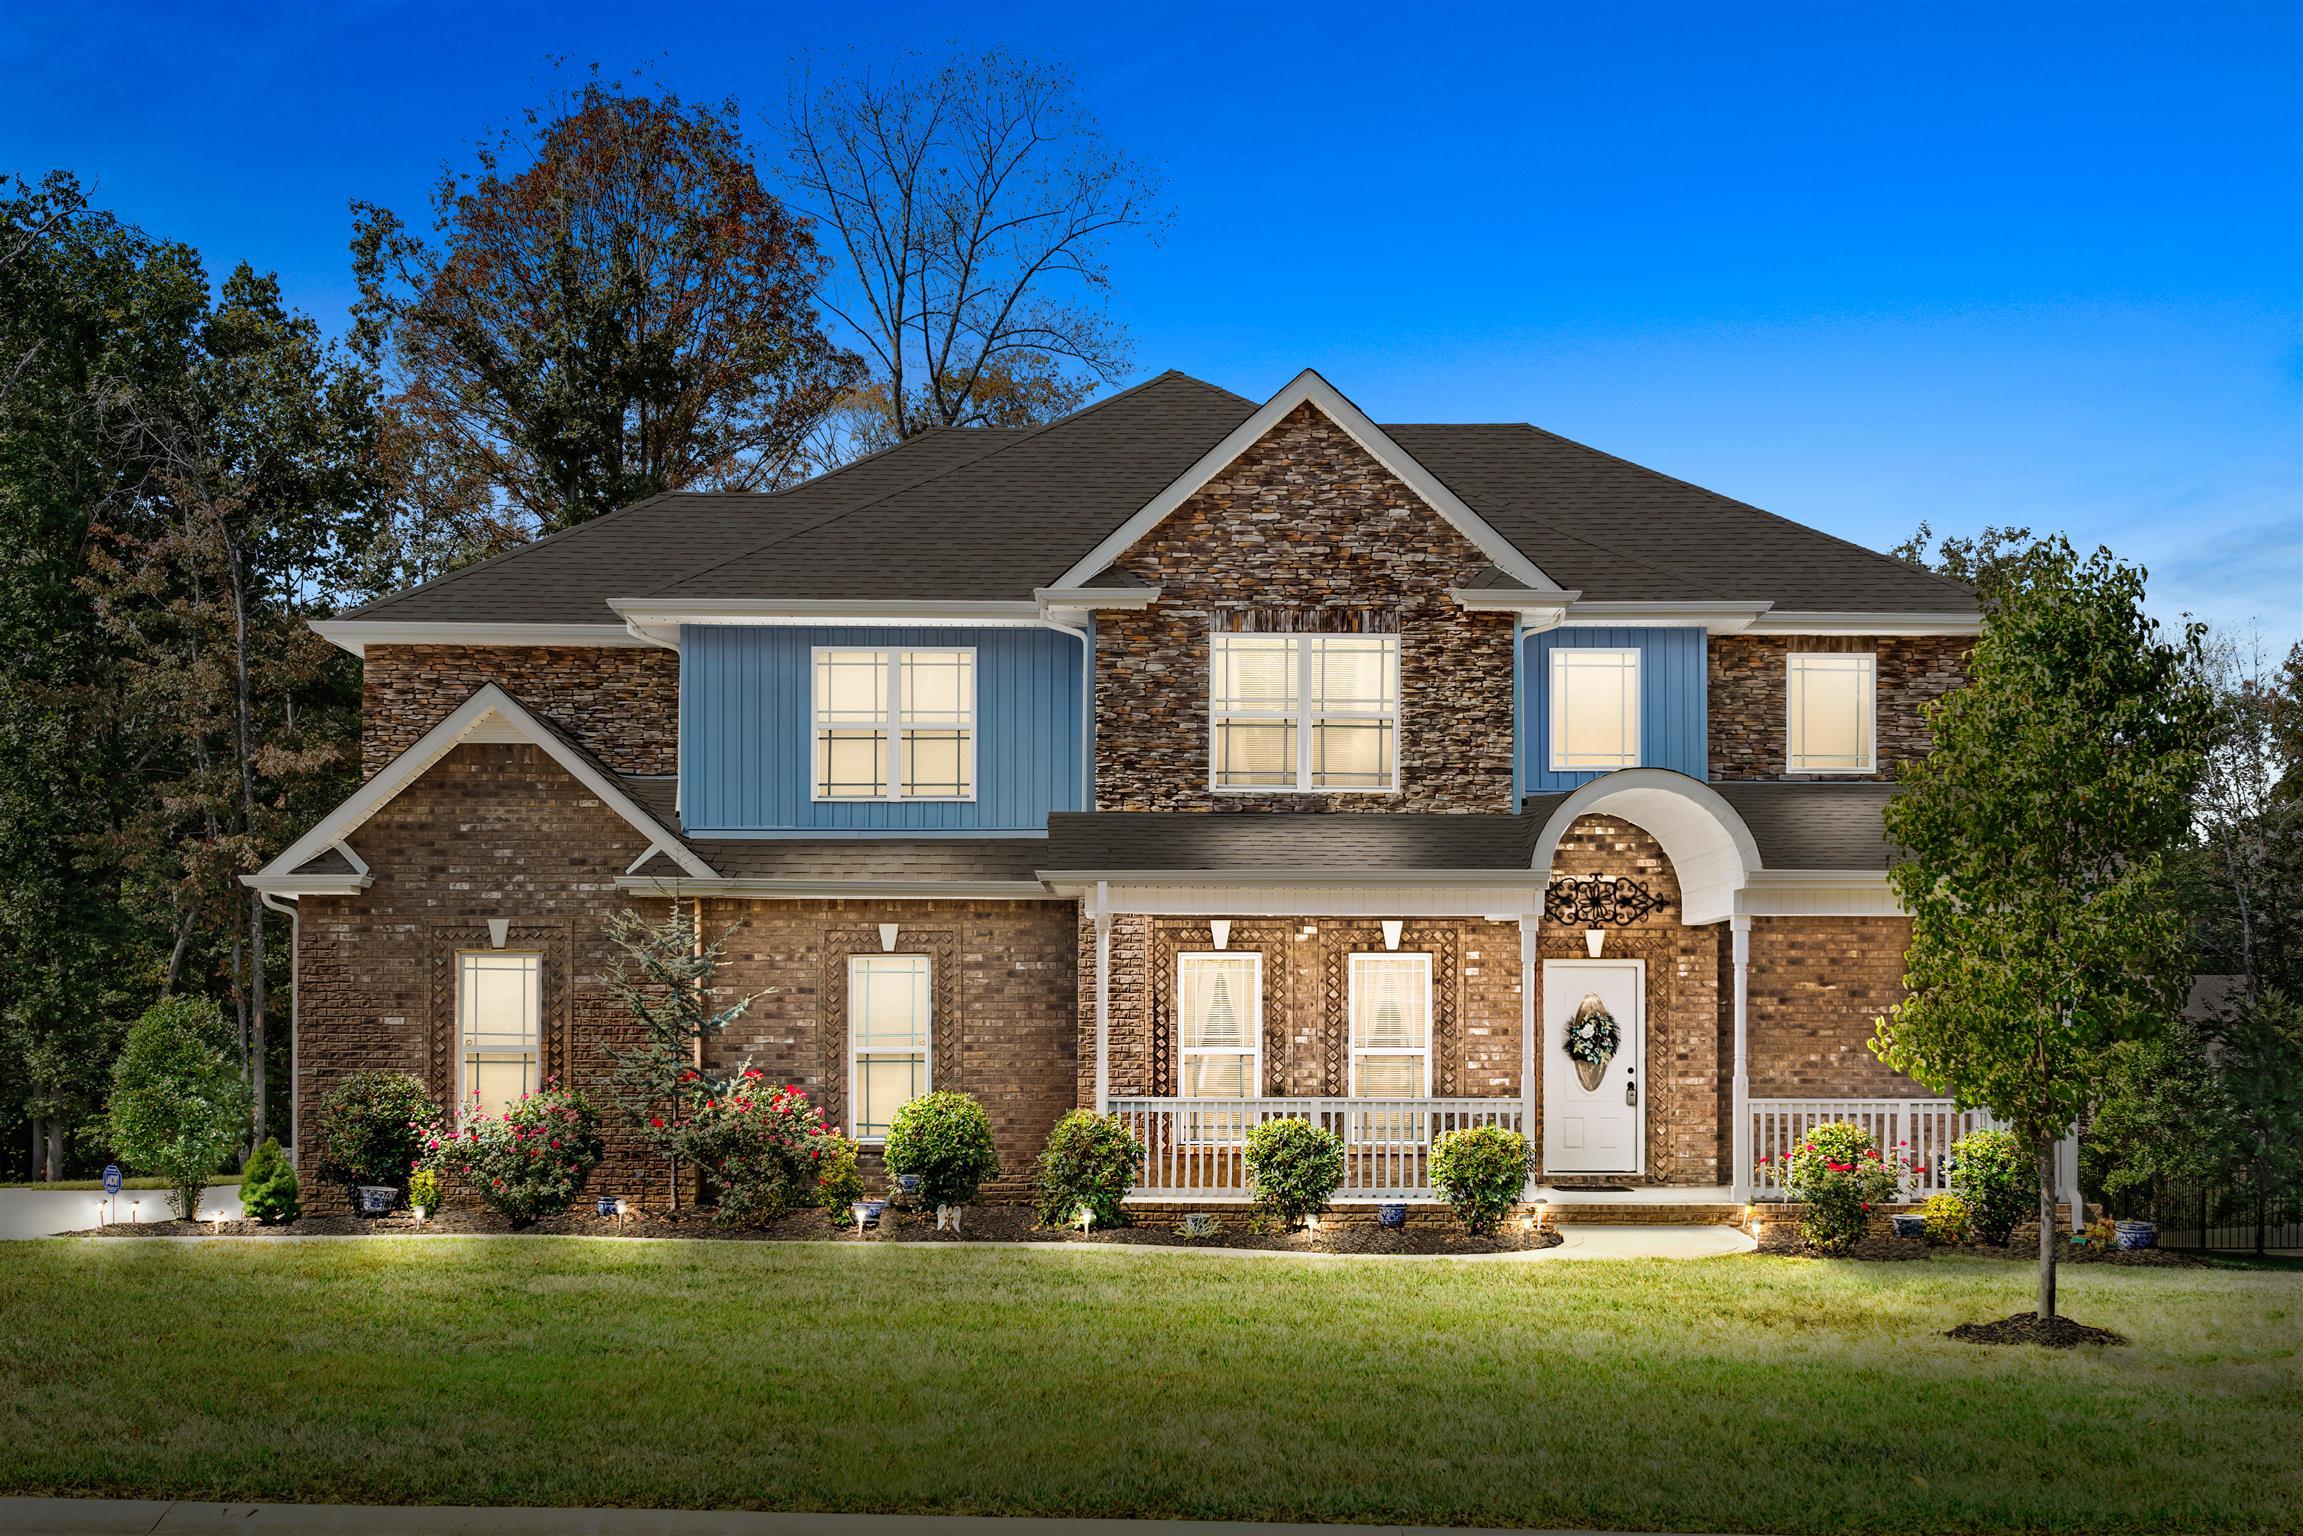 1760 Double R Blvd, Clarksville, TN 37042 - Clarksville, TN real estate listing